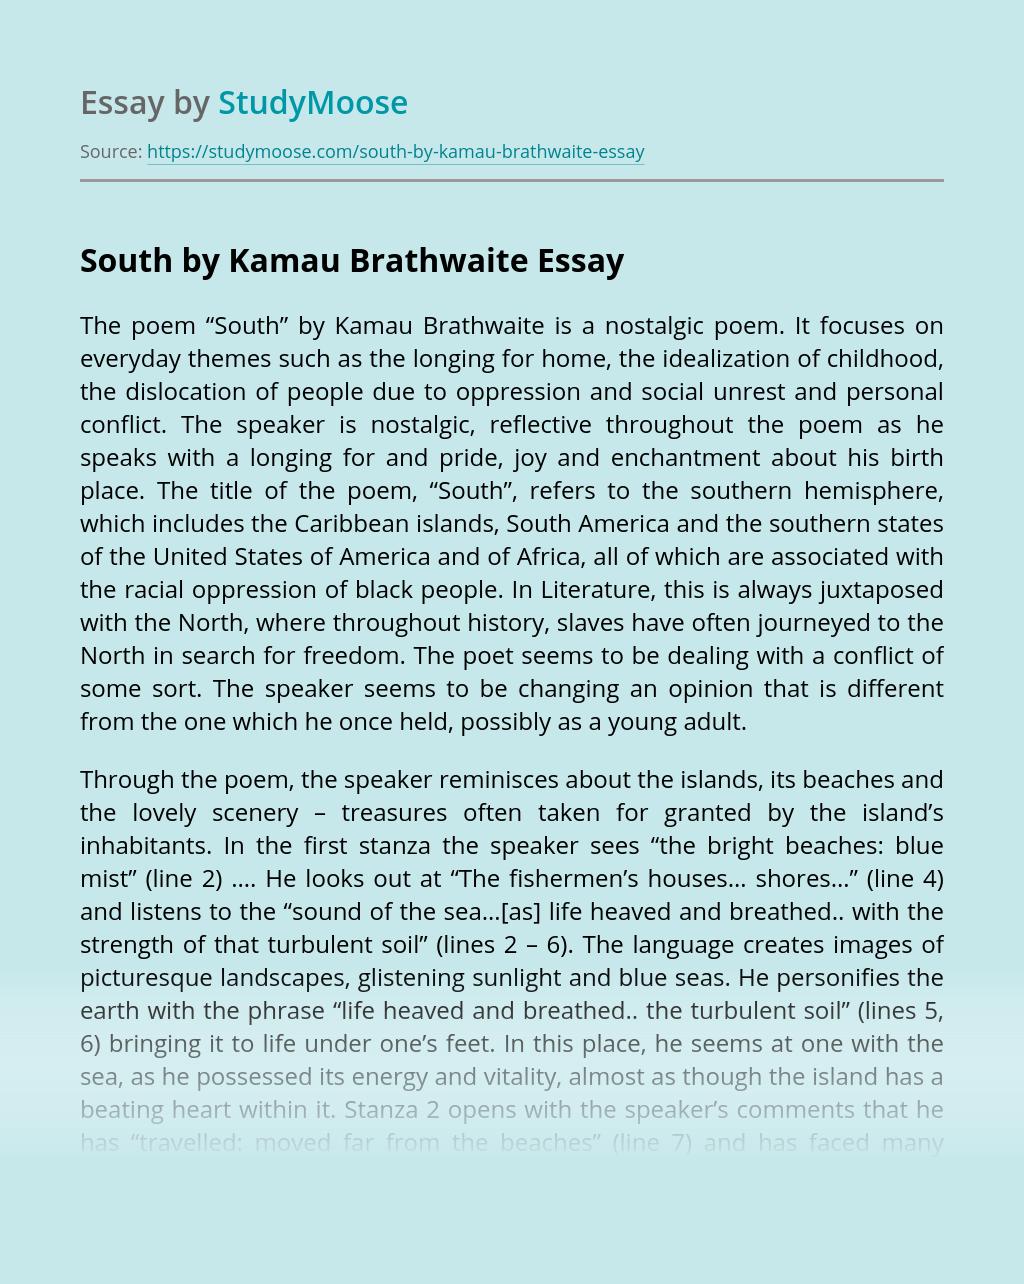 South by Kamau Brathwaite